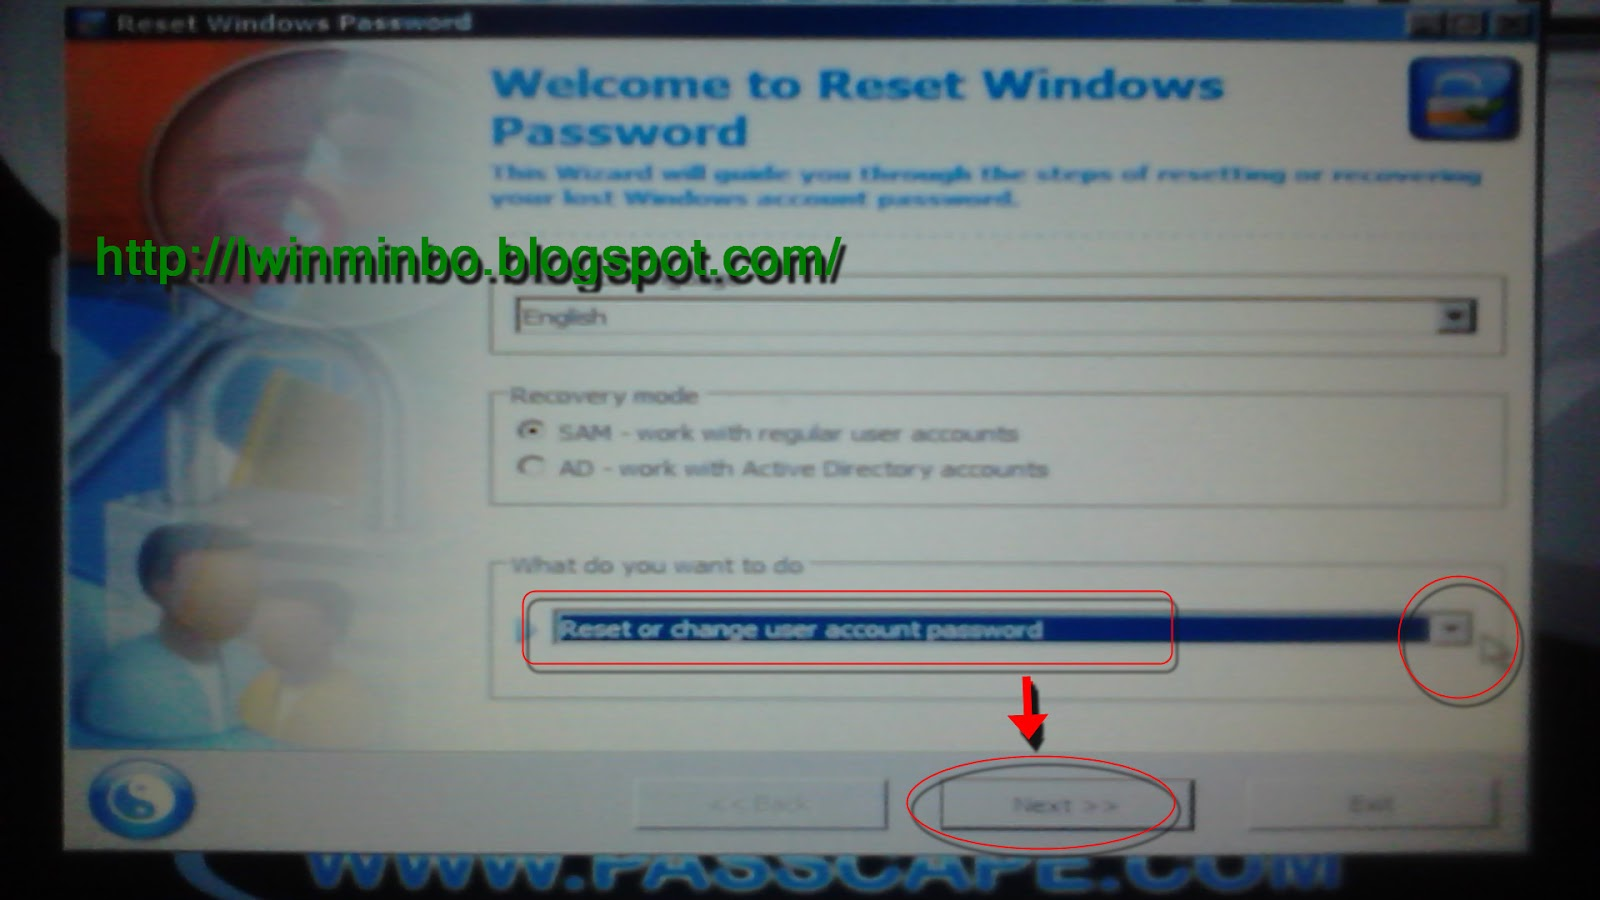 Paradox password recovery key